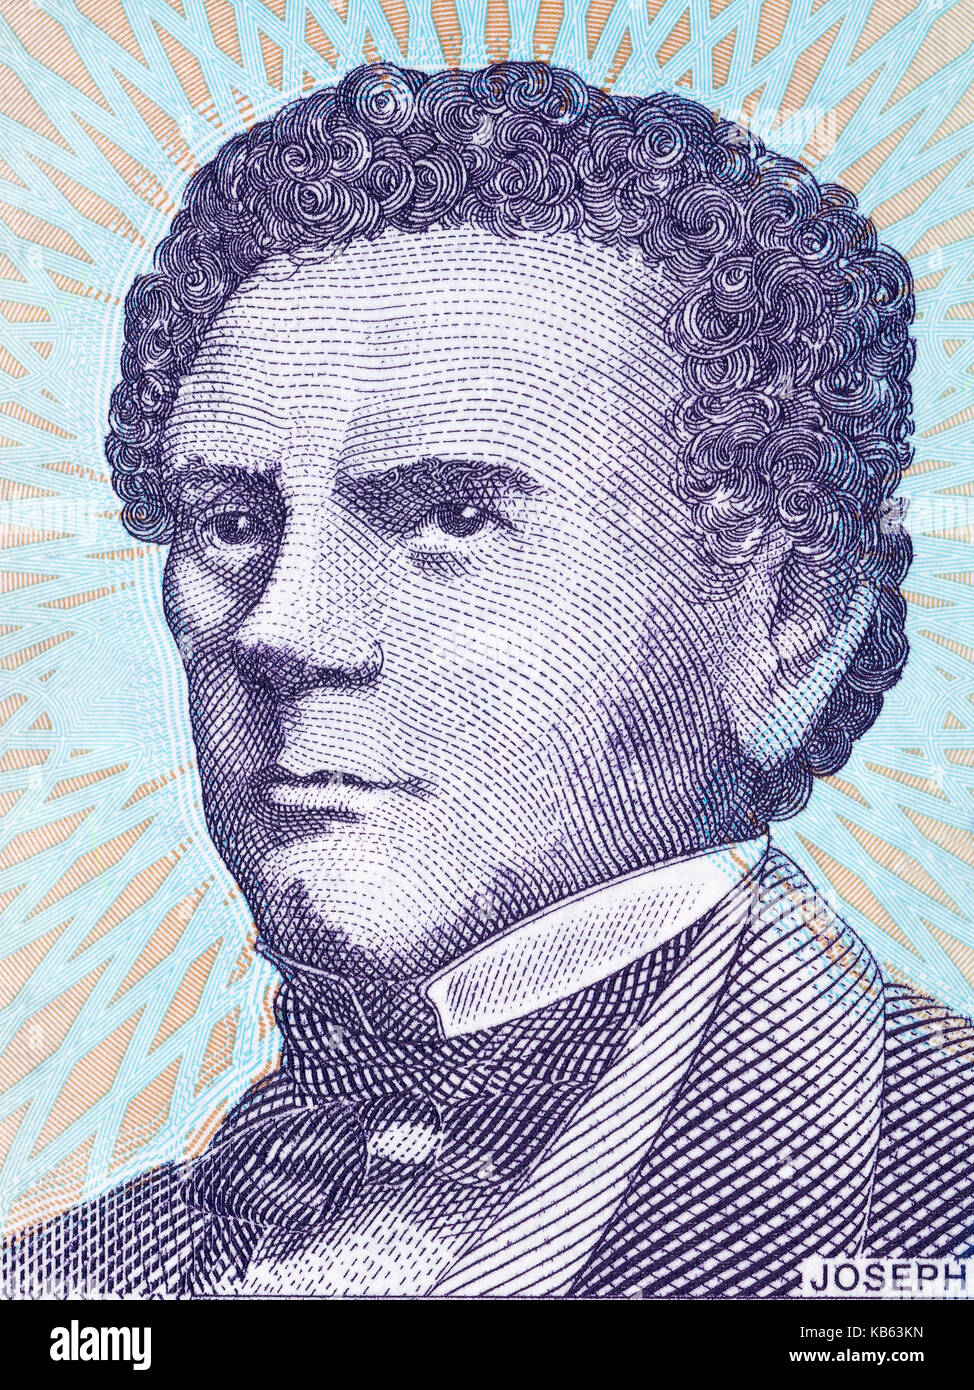 Joseph Jenkins Roberts portrait from Liberian dollars - Stock Image